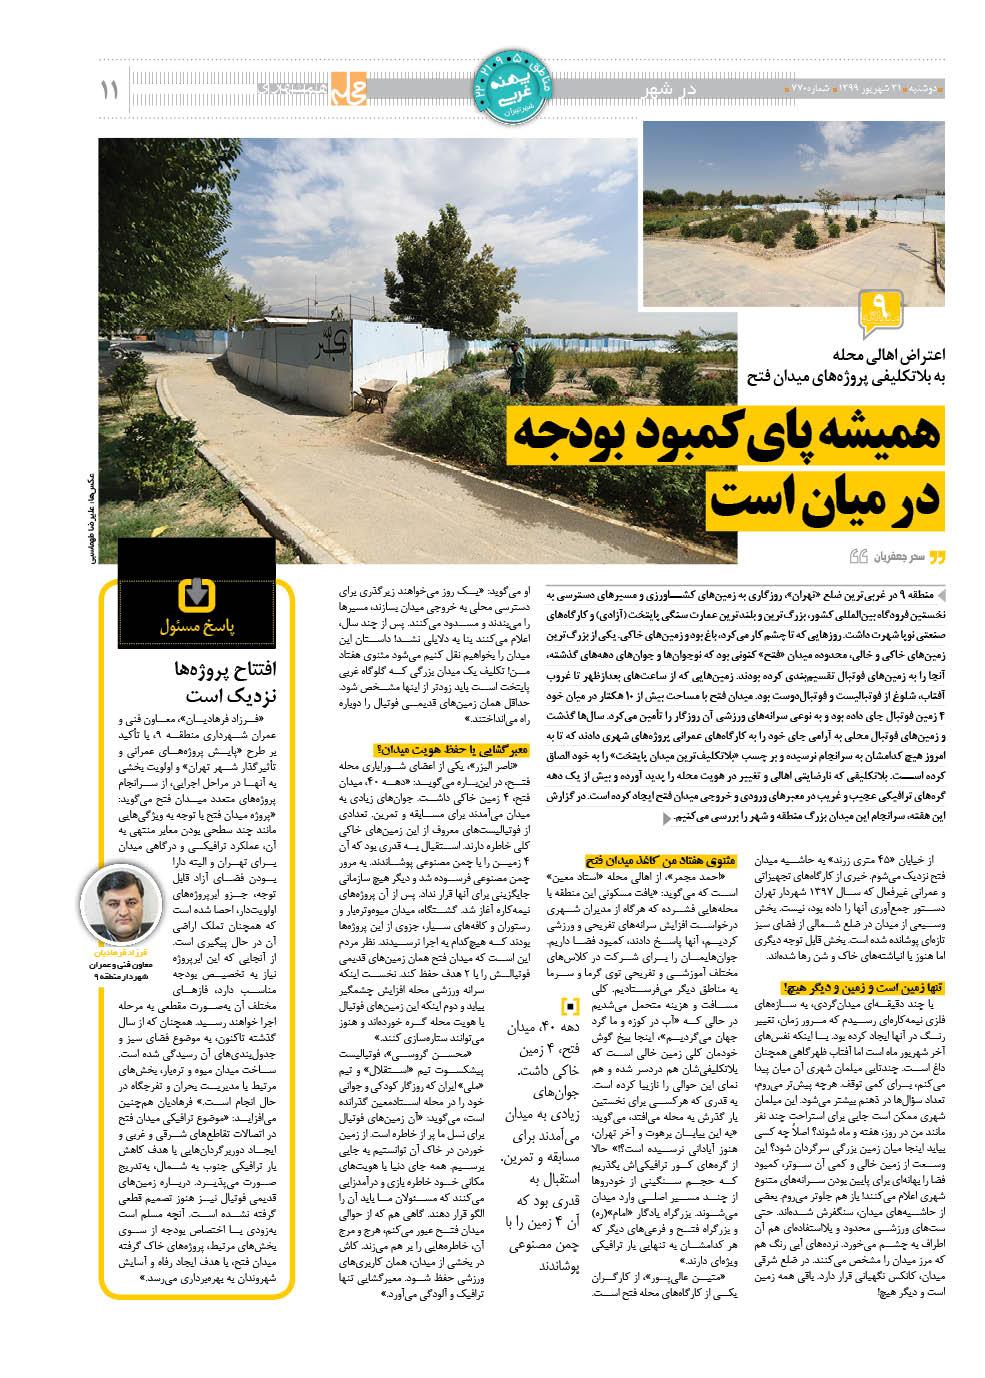 صفحه 11 محله